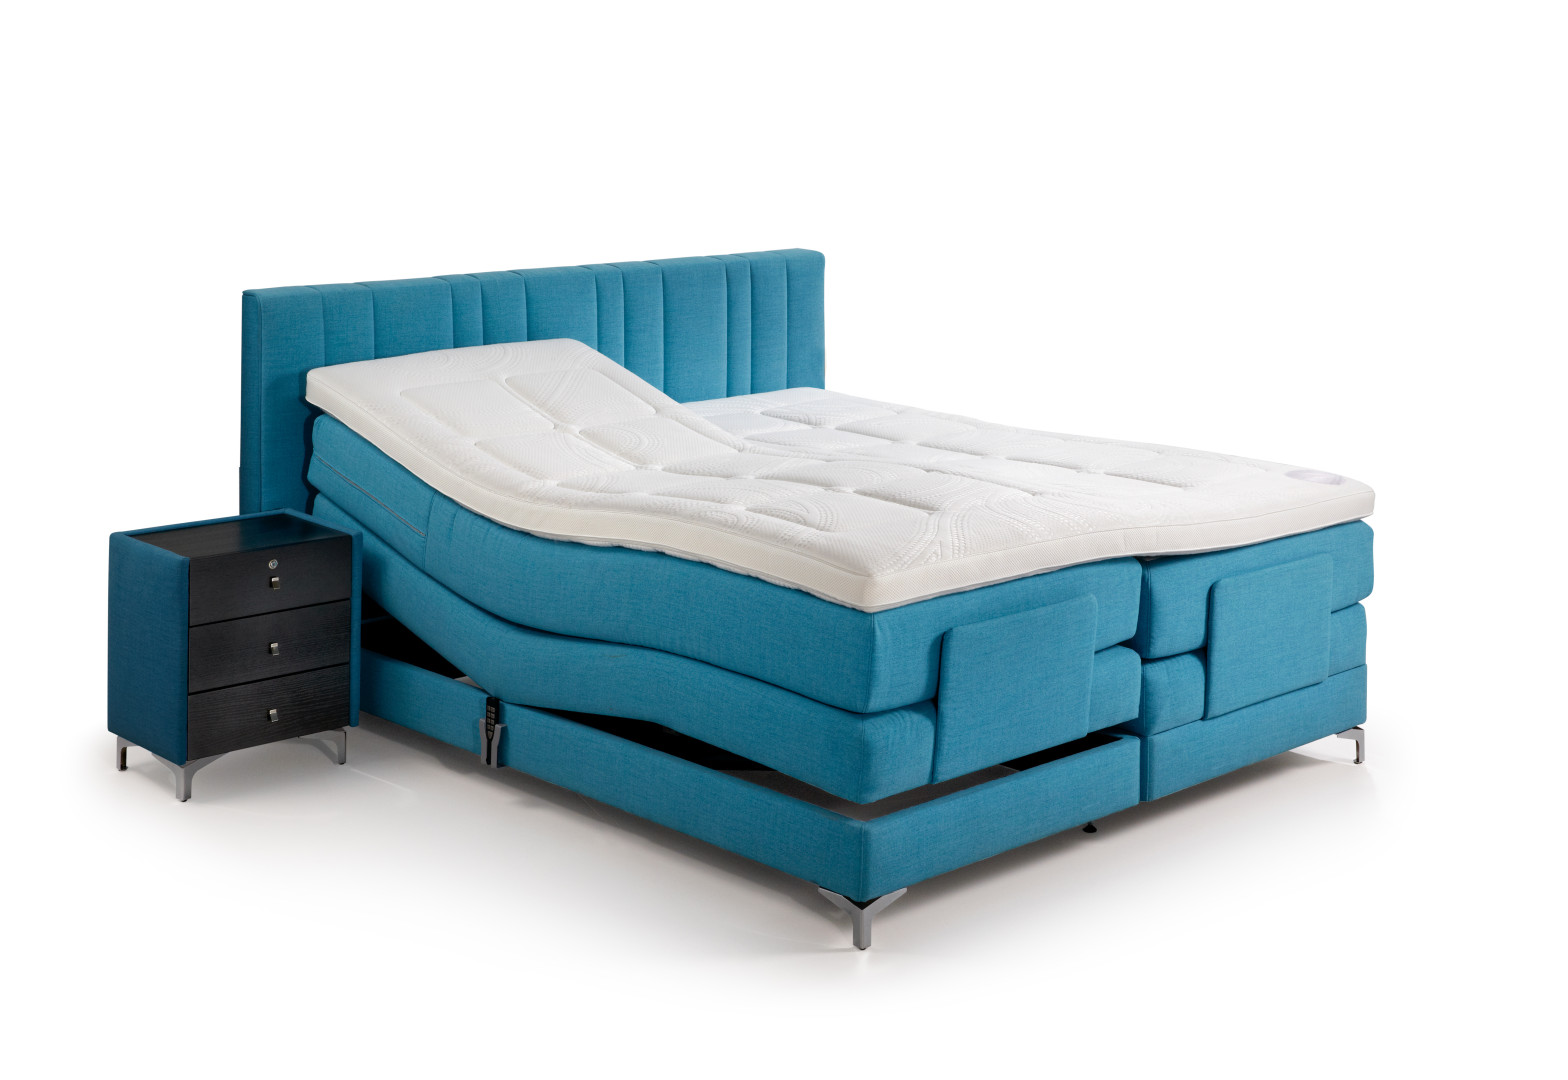 luxusn boxsprings postele belgick zna ky velda. Black Bedroom Furniture Sets. Home Design Ideas